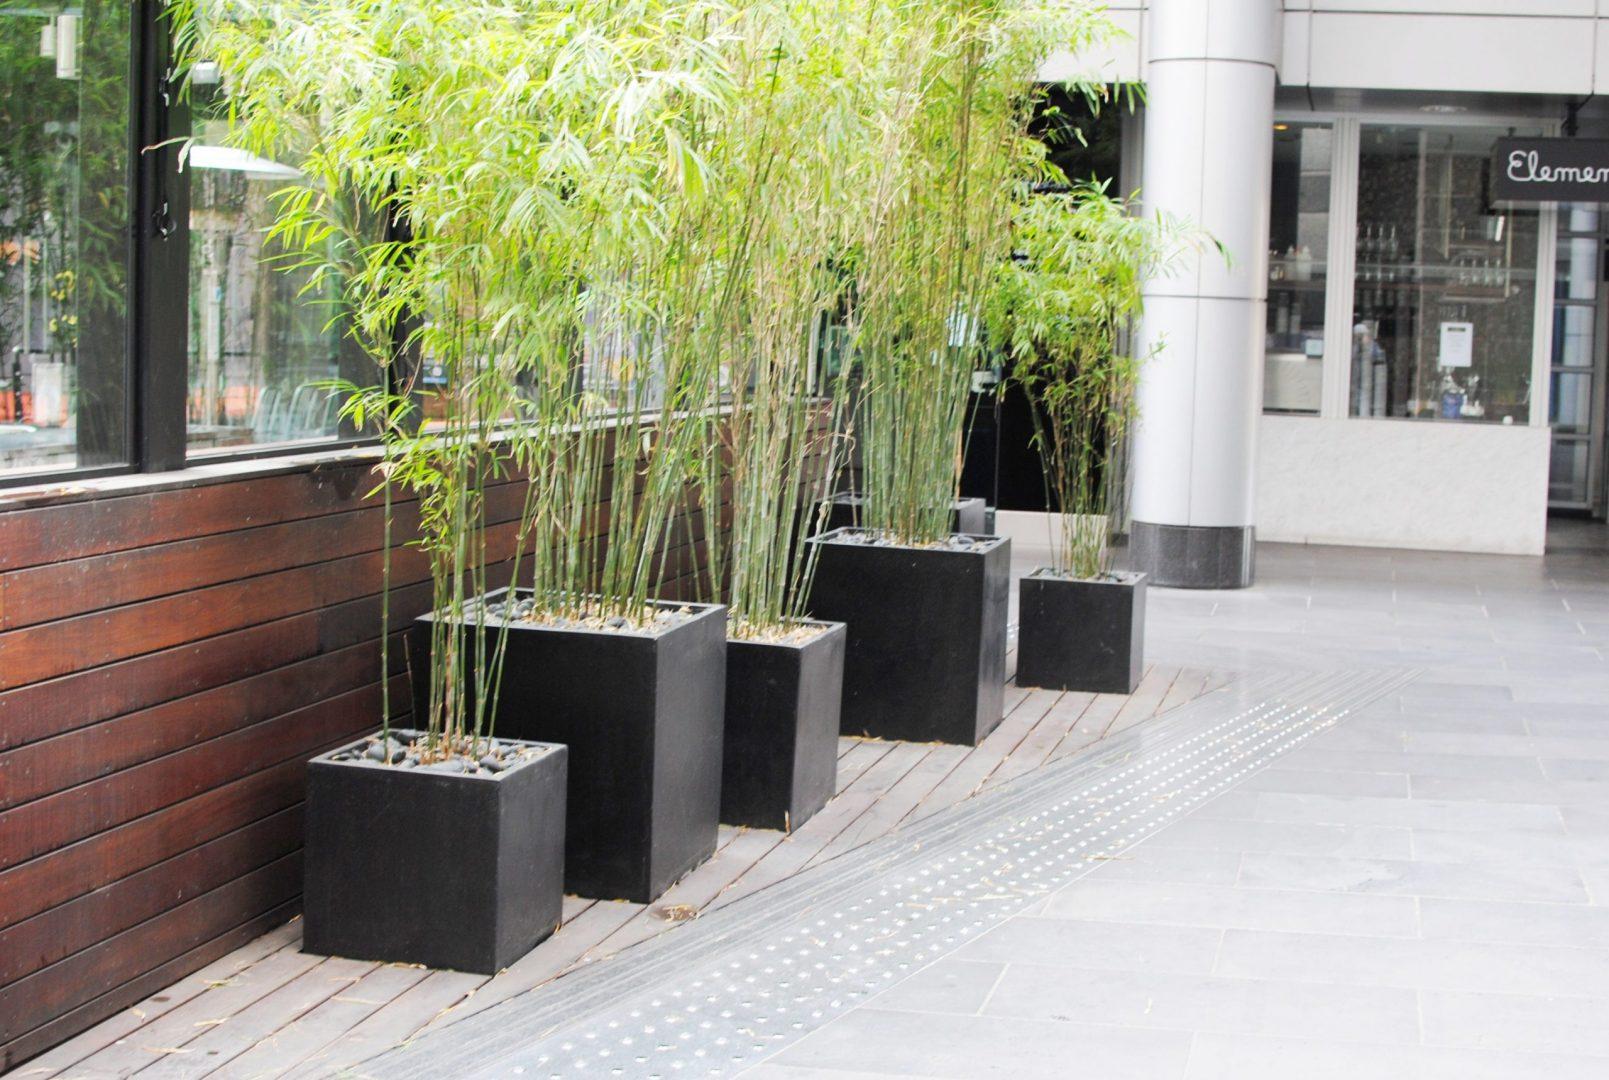 Garden Pots scaled